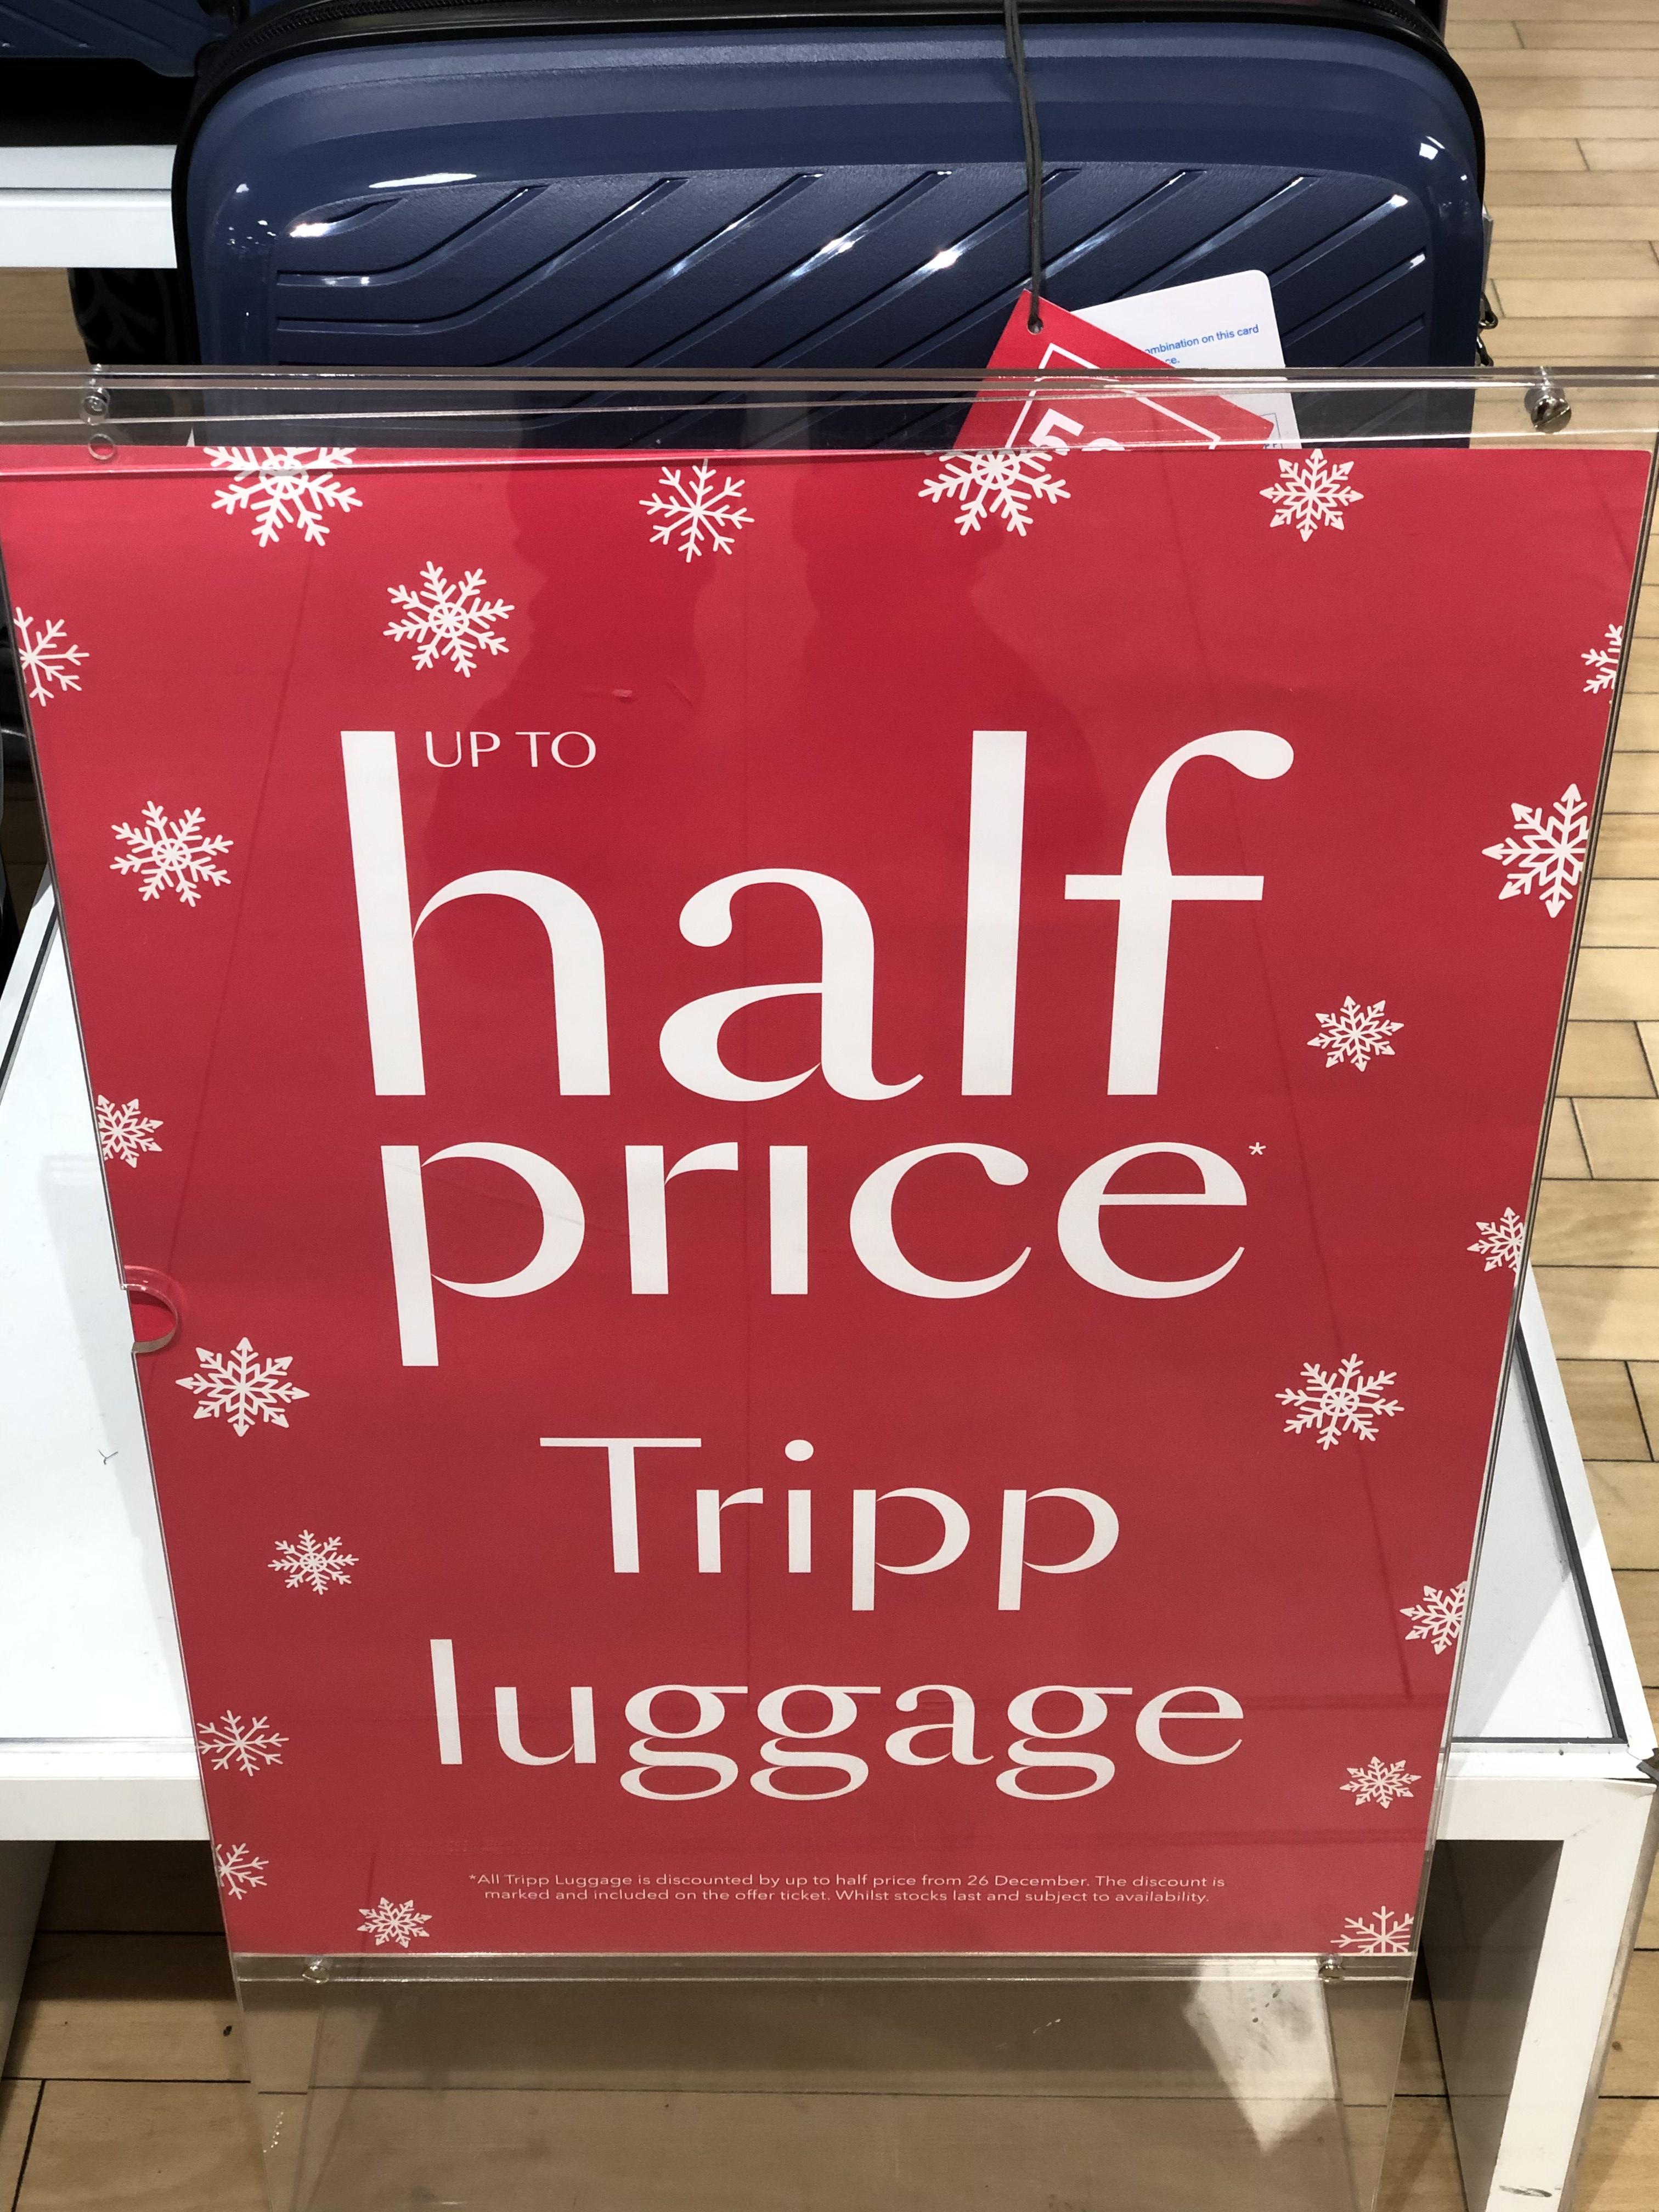 Up to Half Price Tripp luggage suitcase at Debenhams with 5 year guarantee